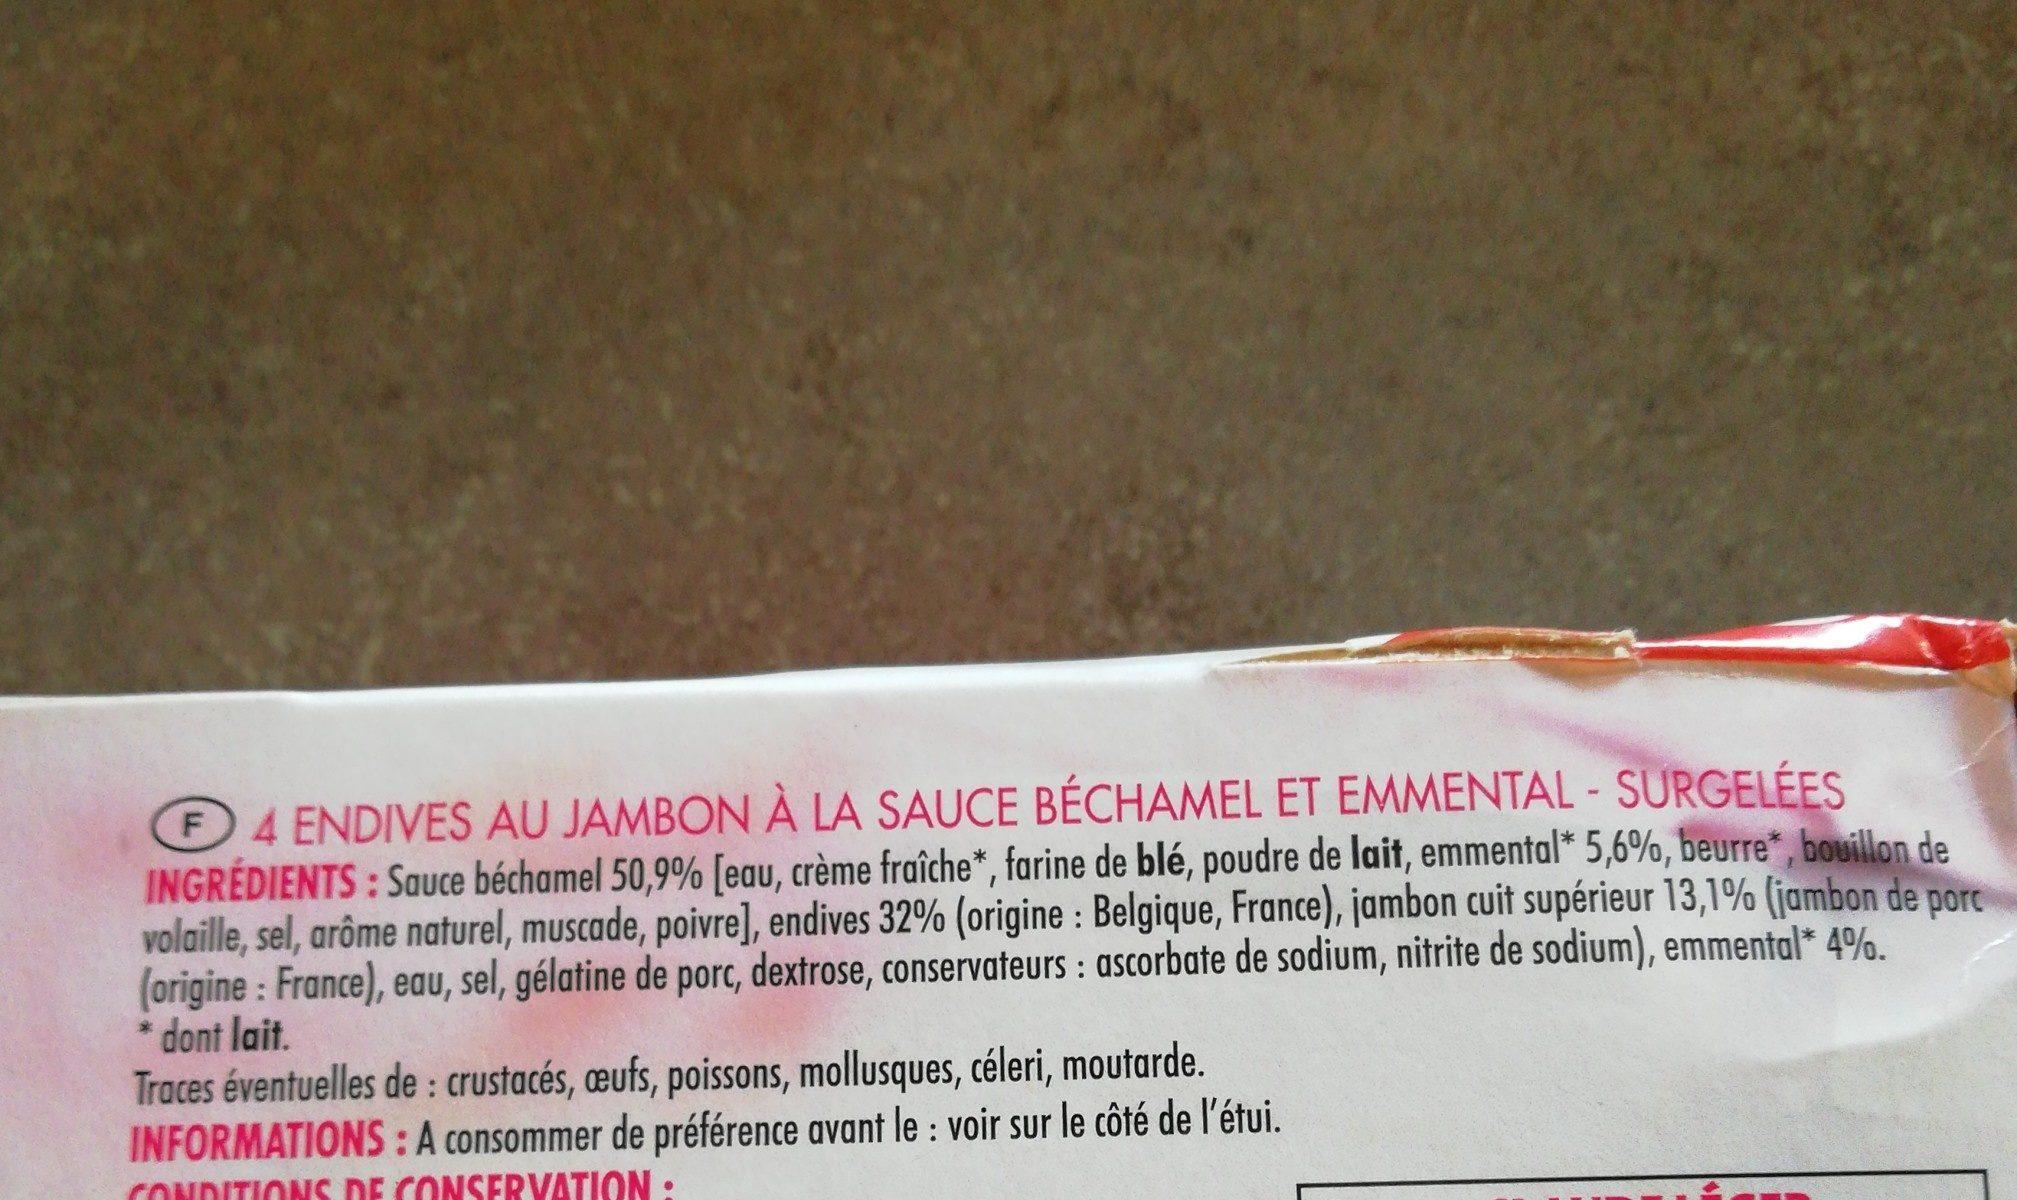 Endives au jambonSauce béchamel et emmental - Ingredients